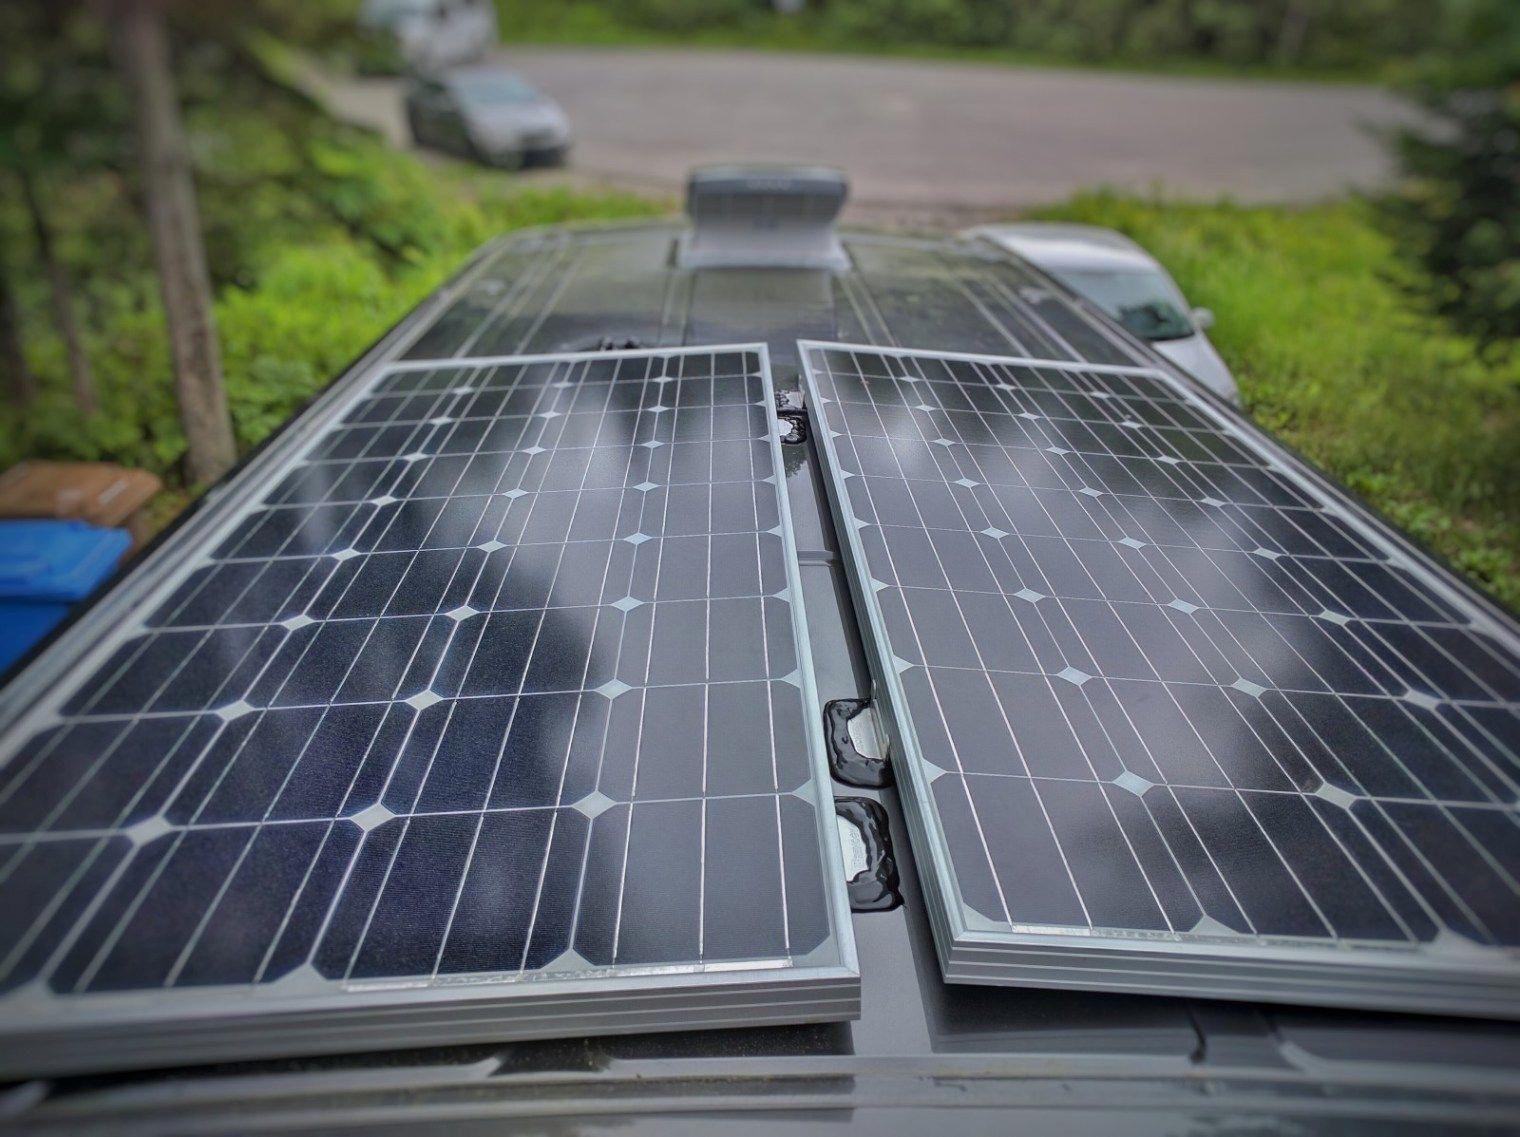 Solar Panels Installation Solarpanels Solarenergy Solarpower Solargenerator Solarpanelkits Solarwa In 2020 Best Solar Panels Solar Panels Monocrystalline Solar Panels